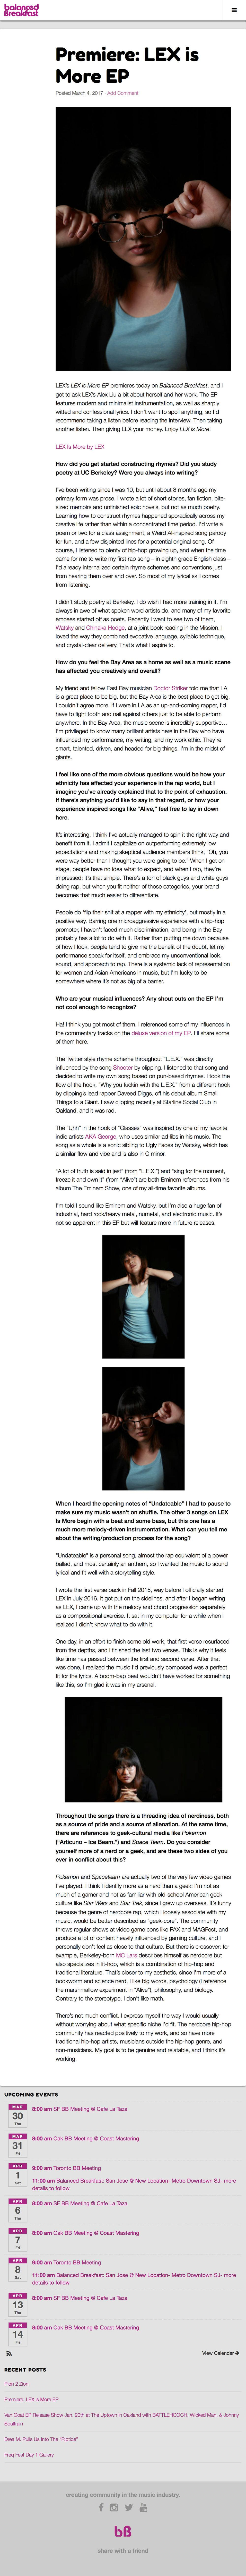 LEX Is More Premiere press article.jpg